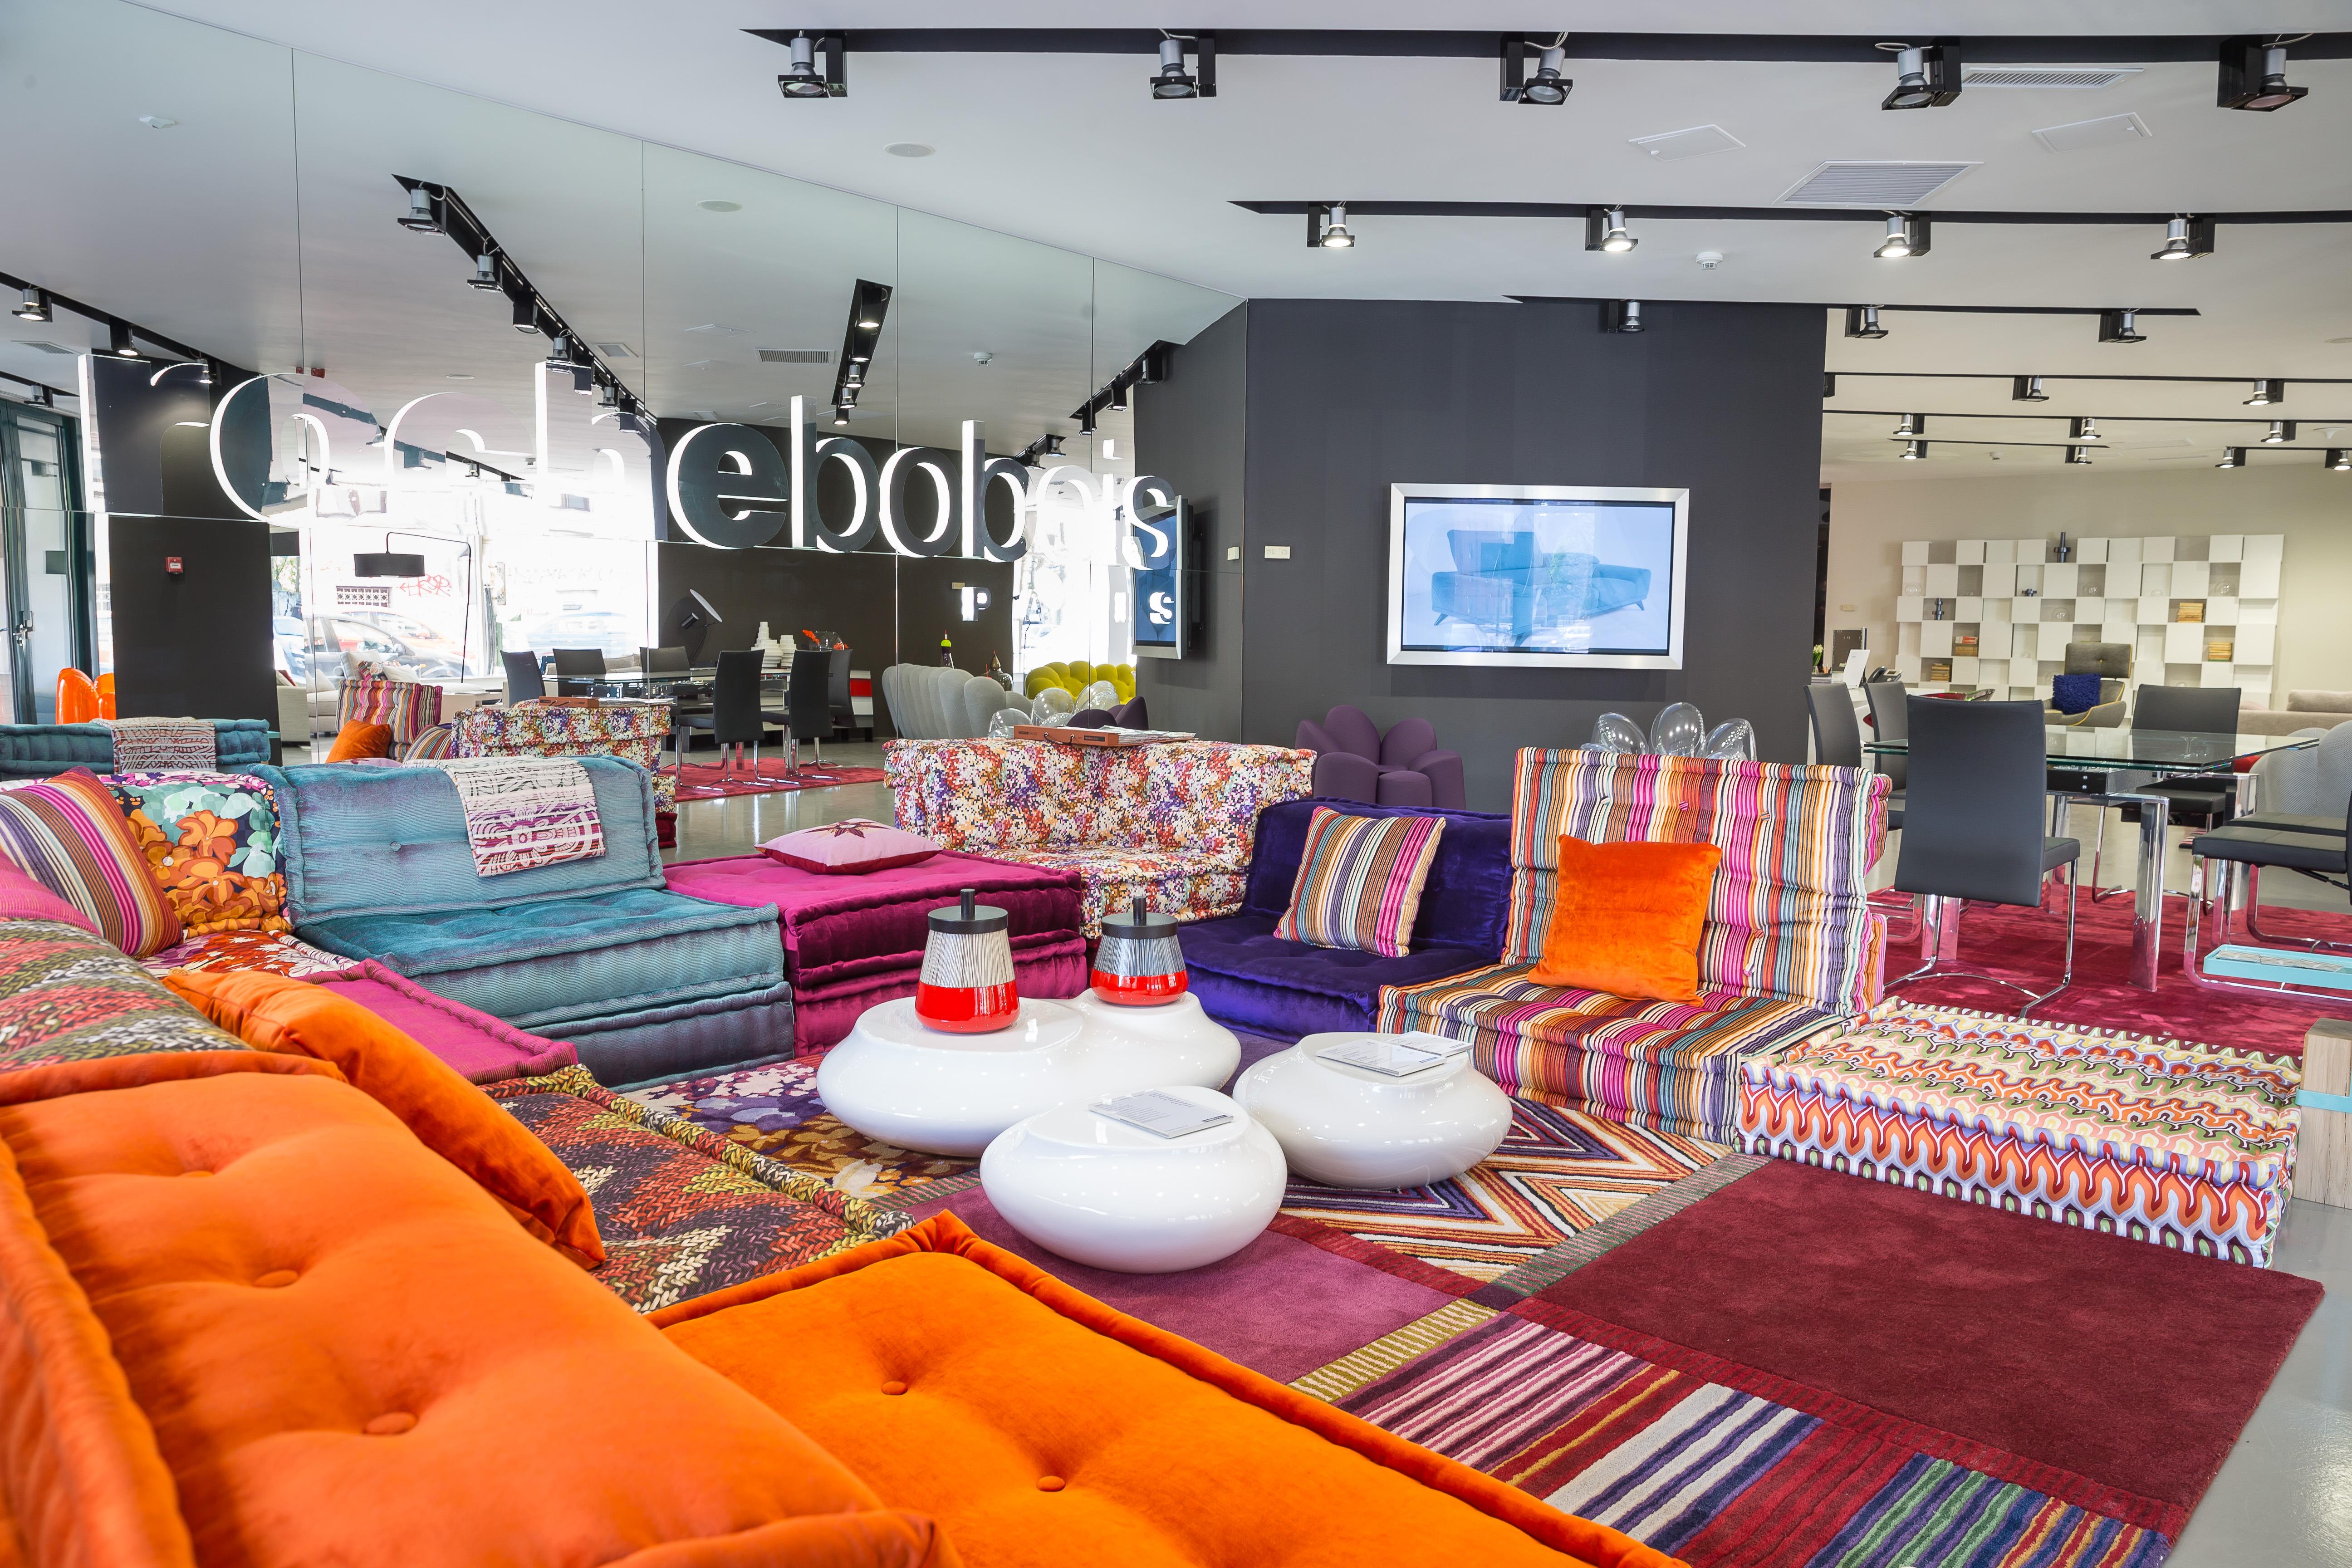 Salotti Roche Bobois.Roche Bobois Opens First Bucharest Store Business Review